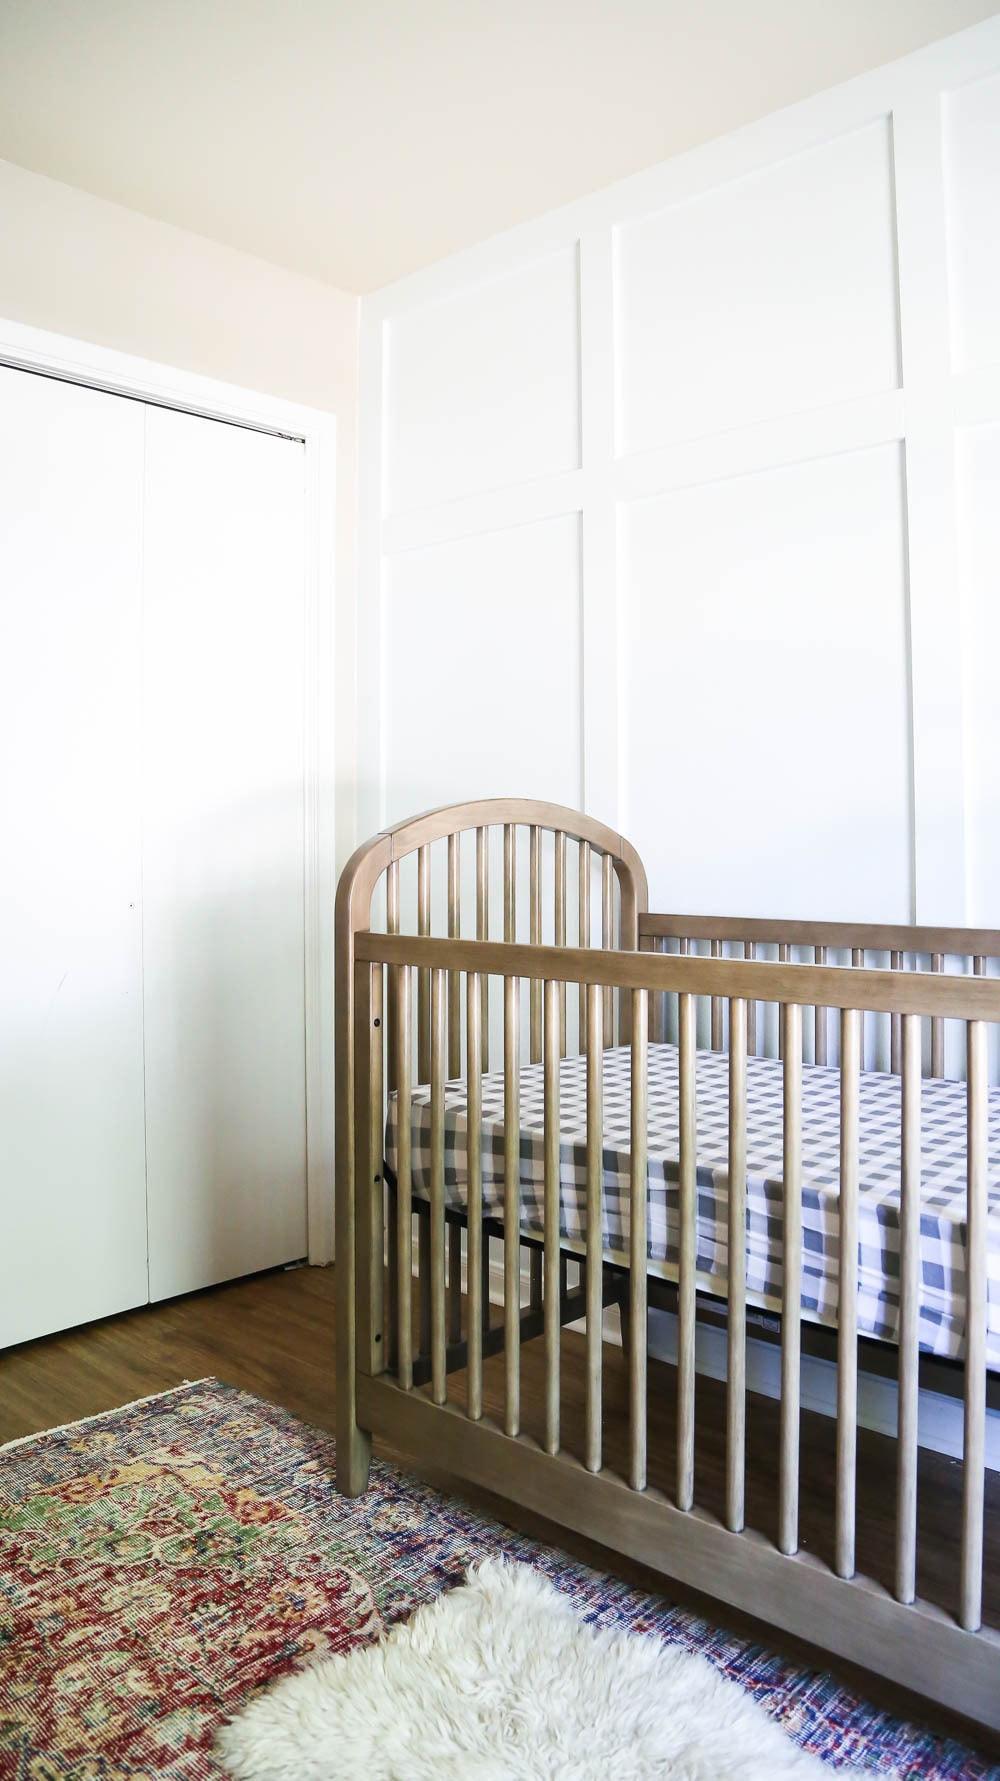 diy board and batten accent wall in nursery